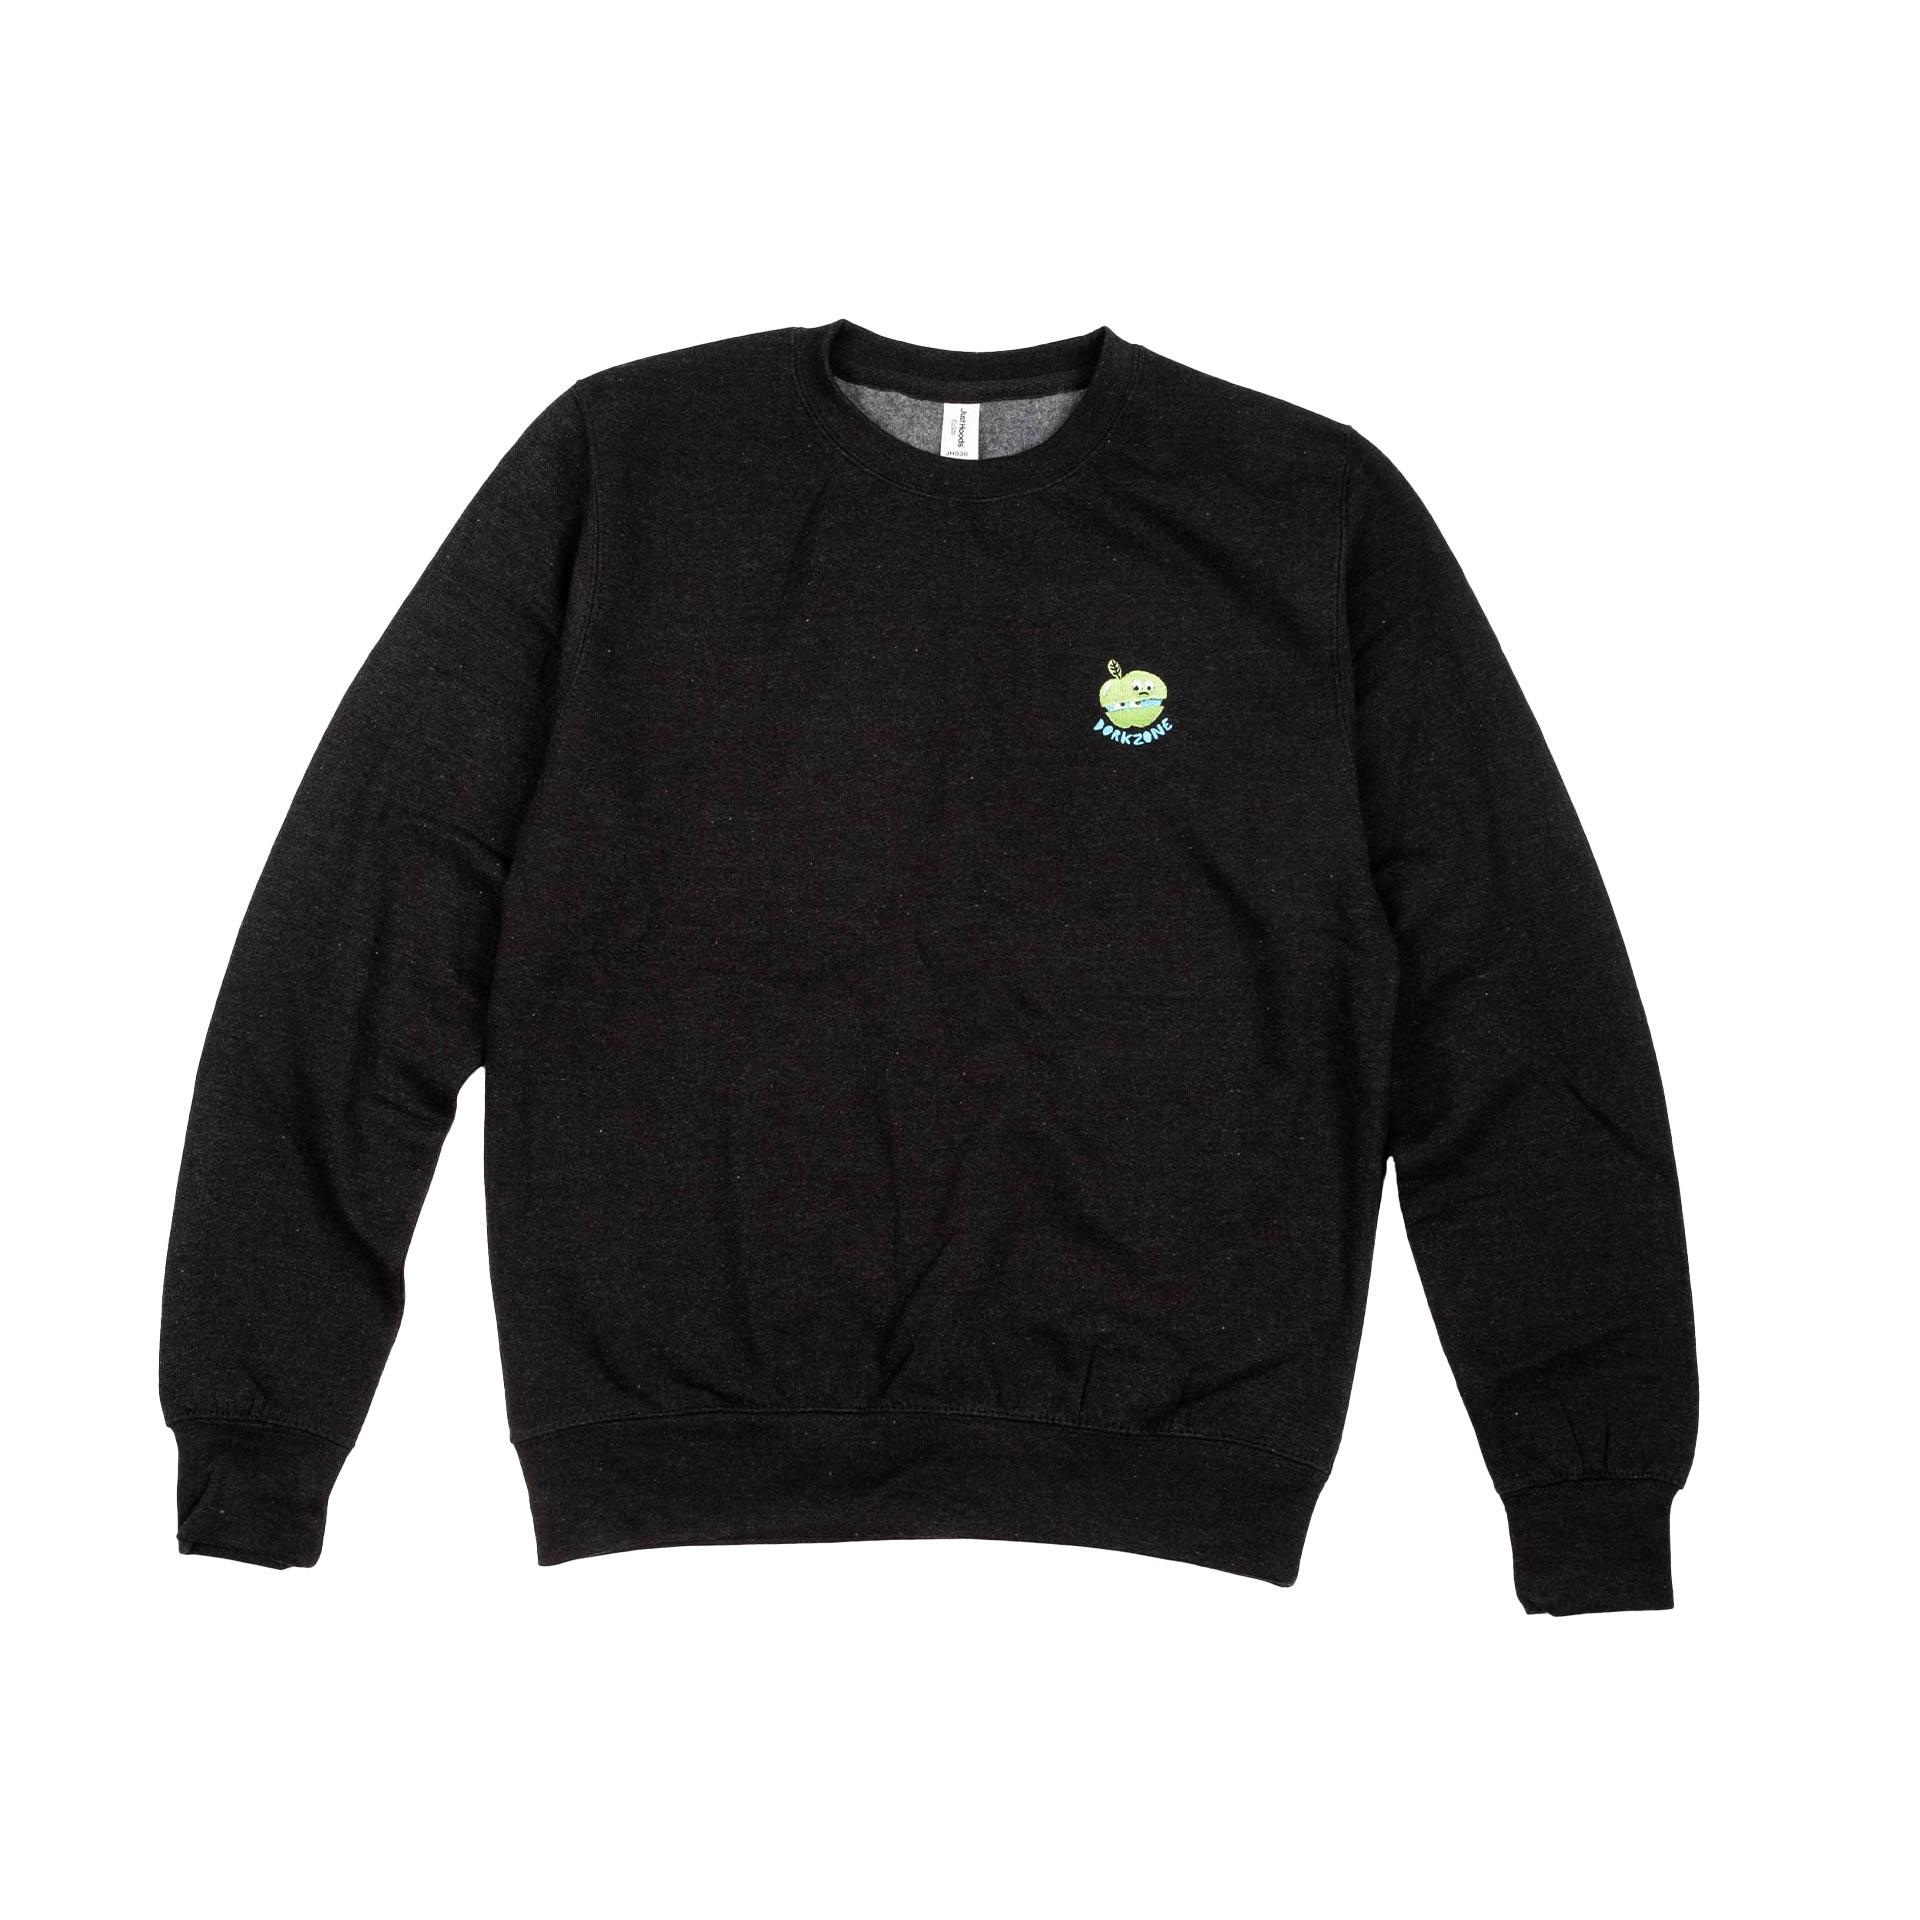 Dorkzone Embroided Apple Sweatshirt Black Smoke